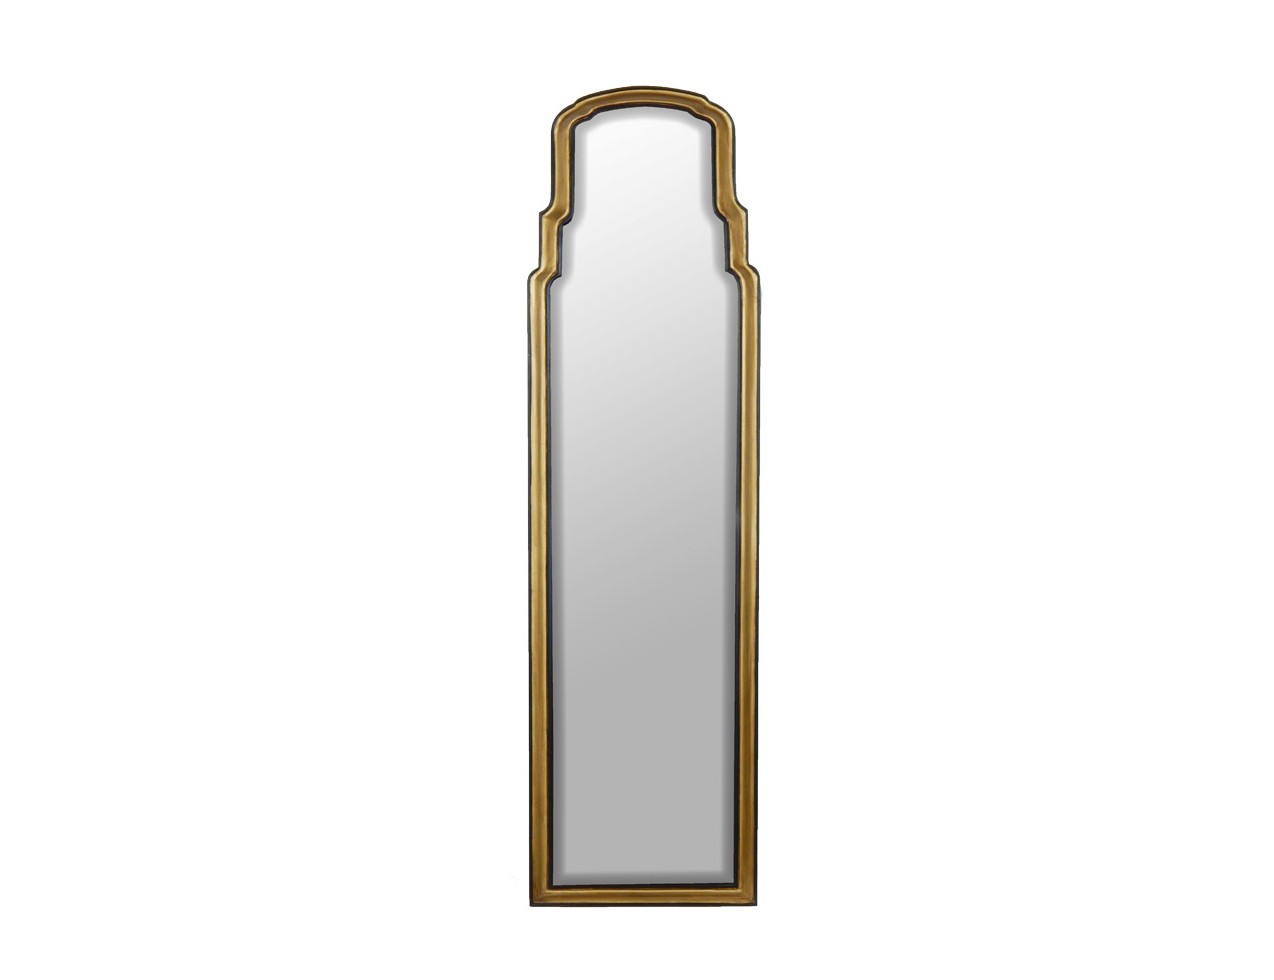 Зеркало GiltНастенные зеркала<br><br><br>Material: Стекло<br>Ширина см: 70<br>Высота см: 220<br>Глубина см: 13